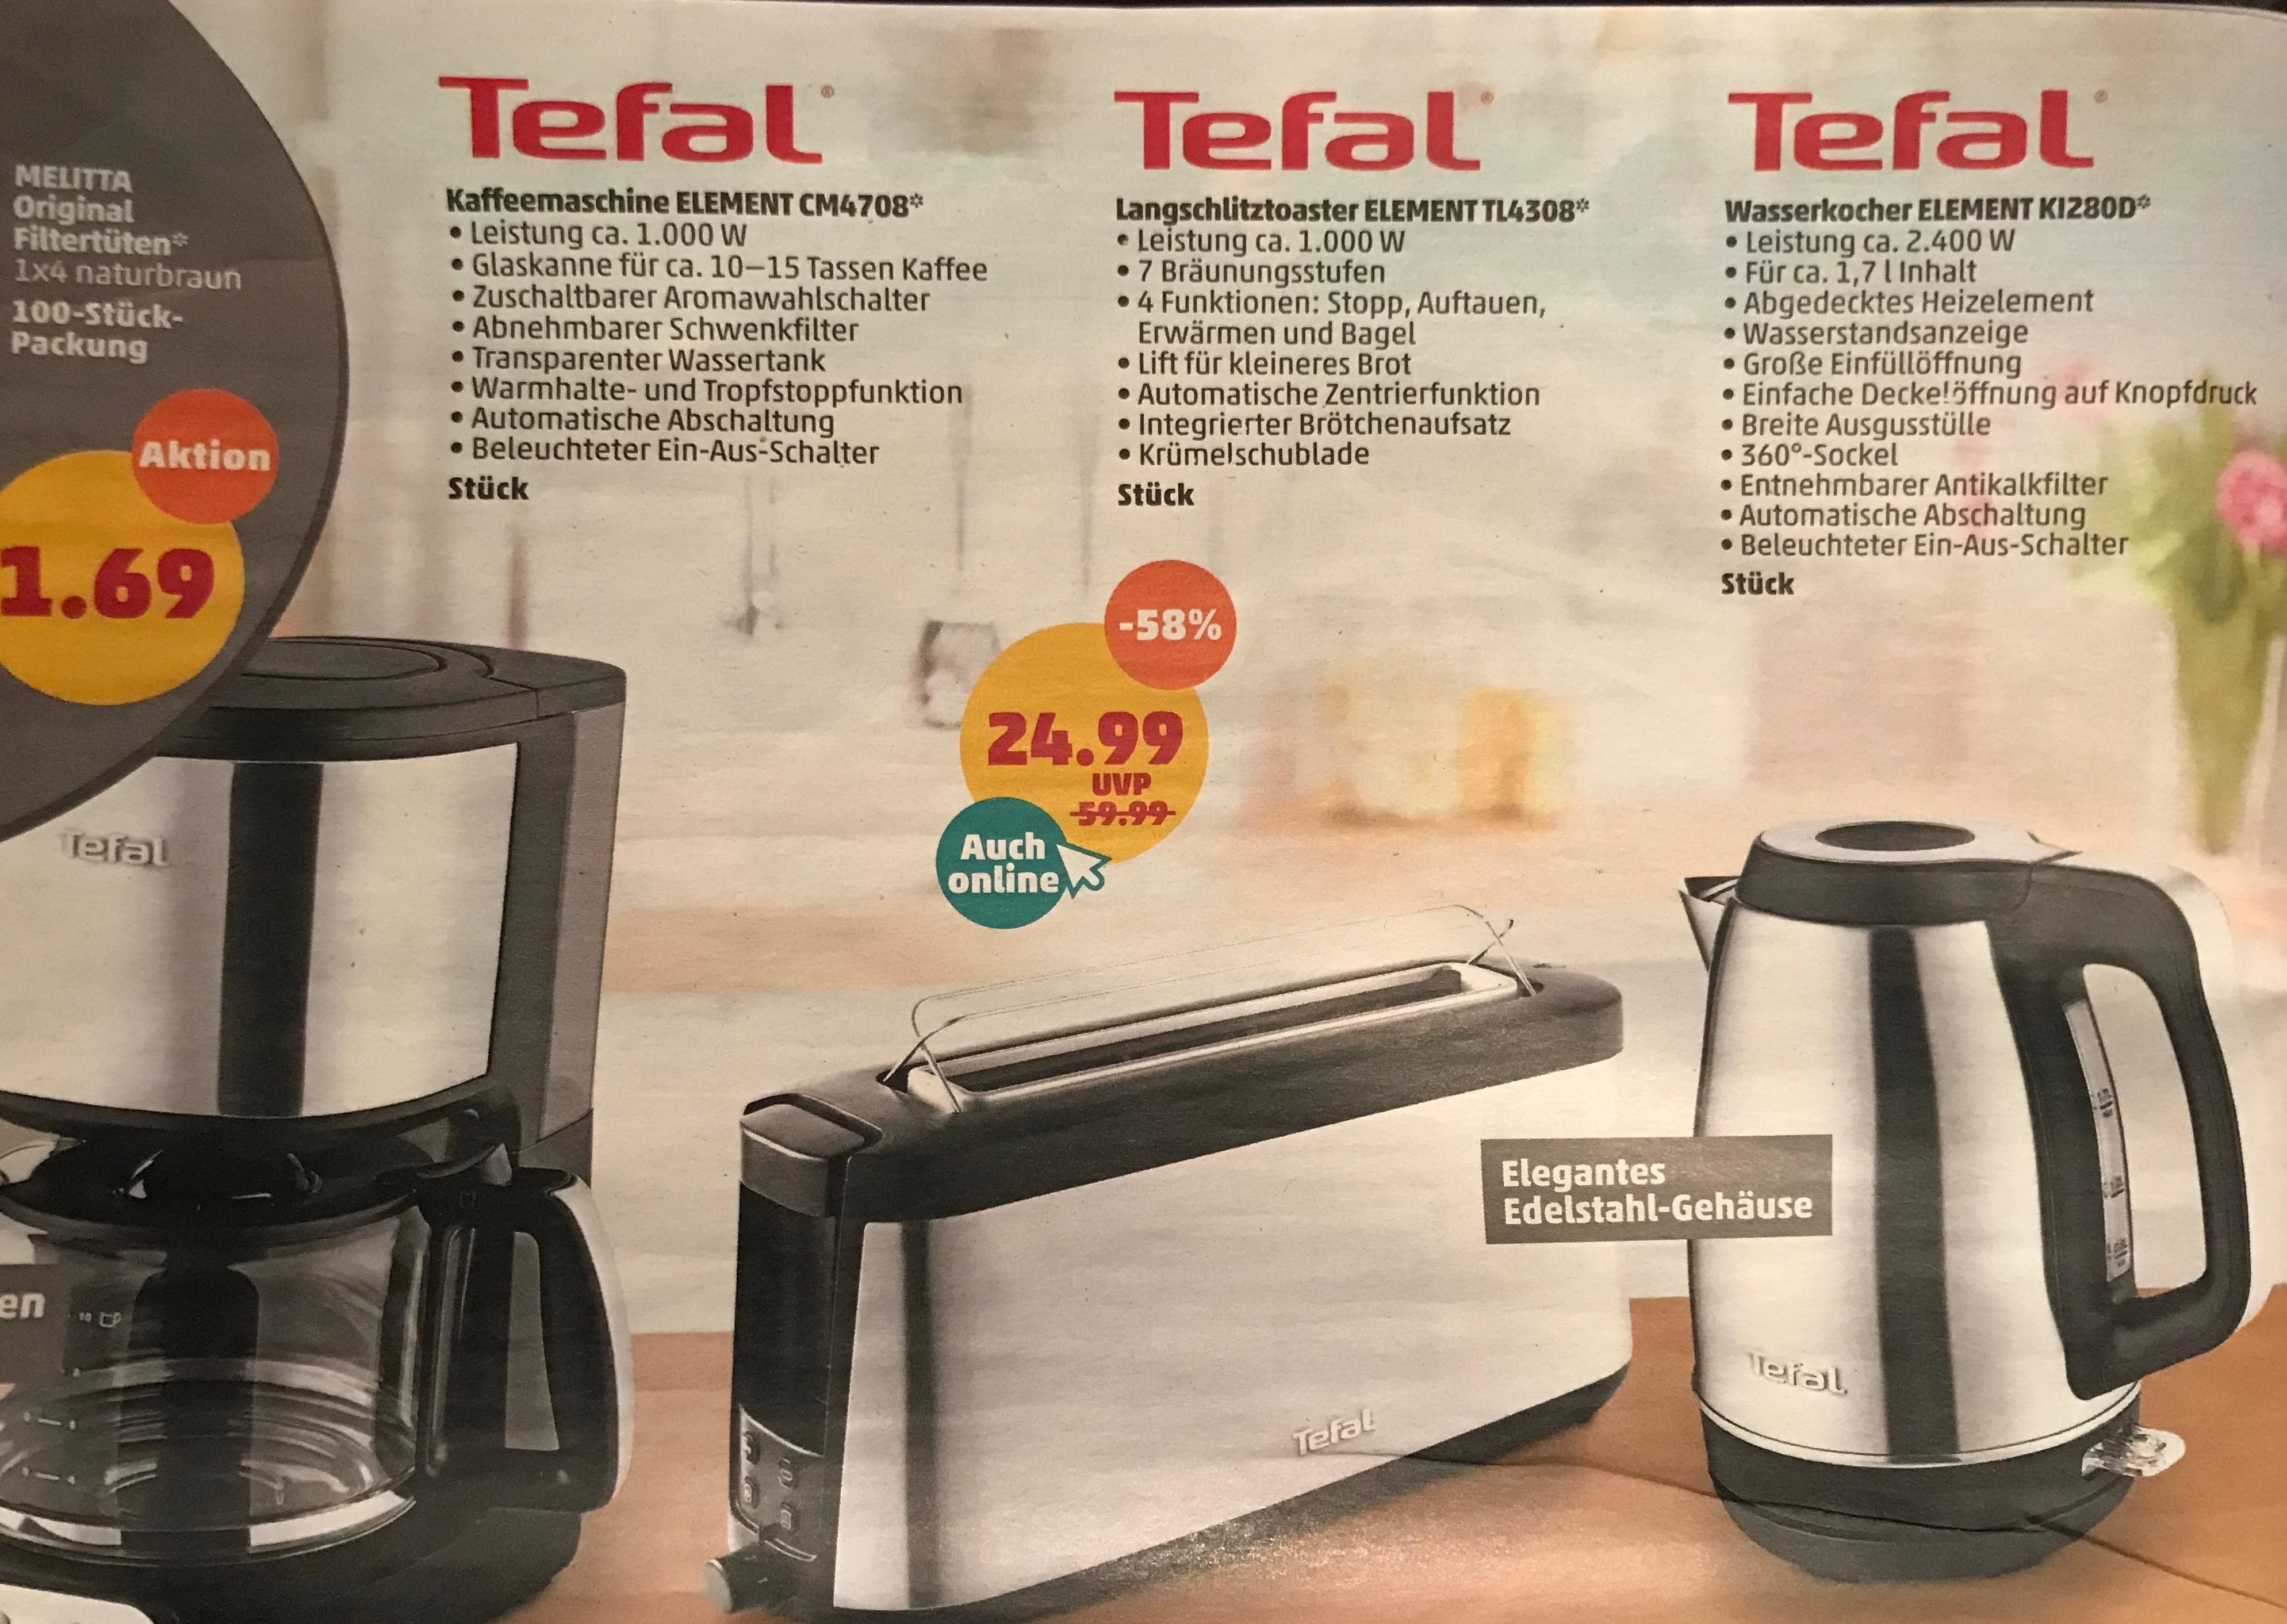 [PENNY] TEFAL Kaffeemaschine & Langschlitztoaster je 24,99 €